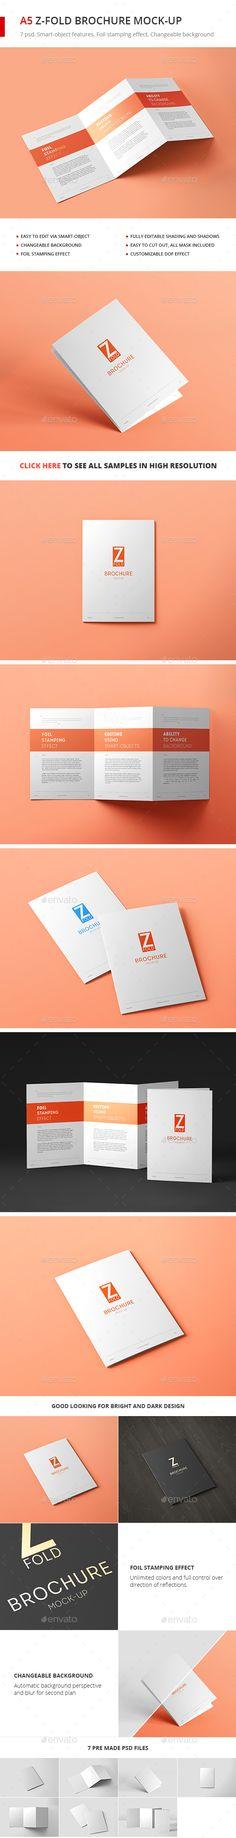 Tri-Fold Brochure A5 Mock-up vol. 2 - #Brochures Print Download here: https://graphicriver.net/item/trifold-brochure-a5-mockup-vol-2/20164517?ref=alena994